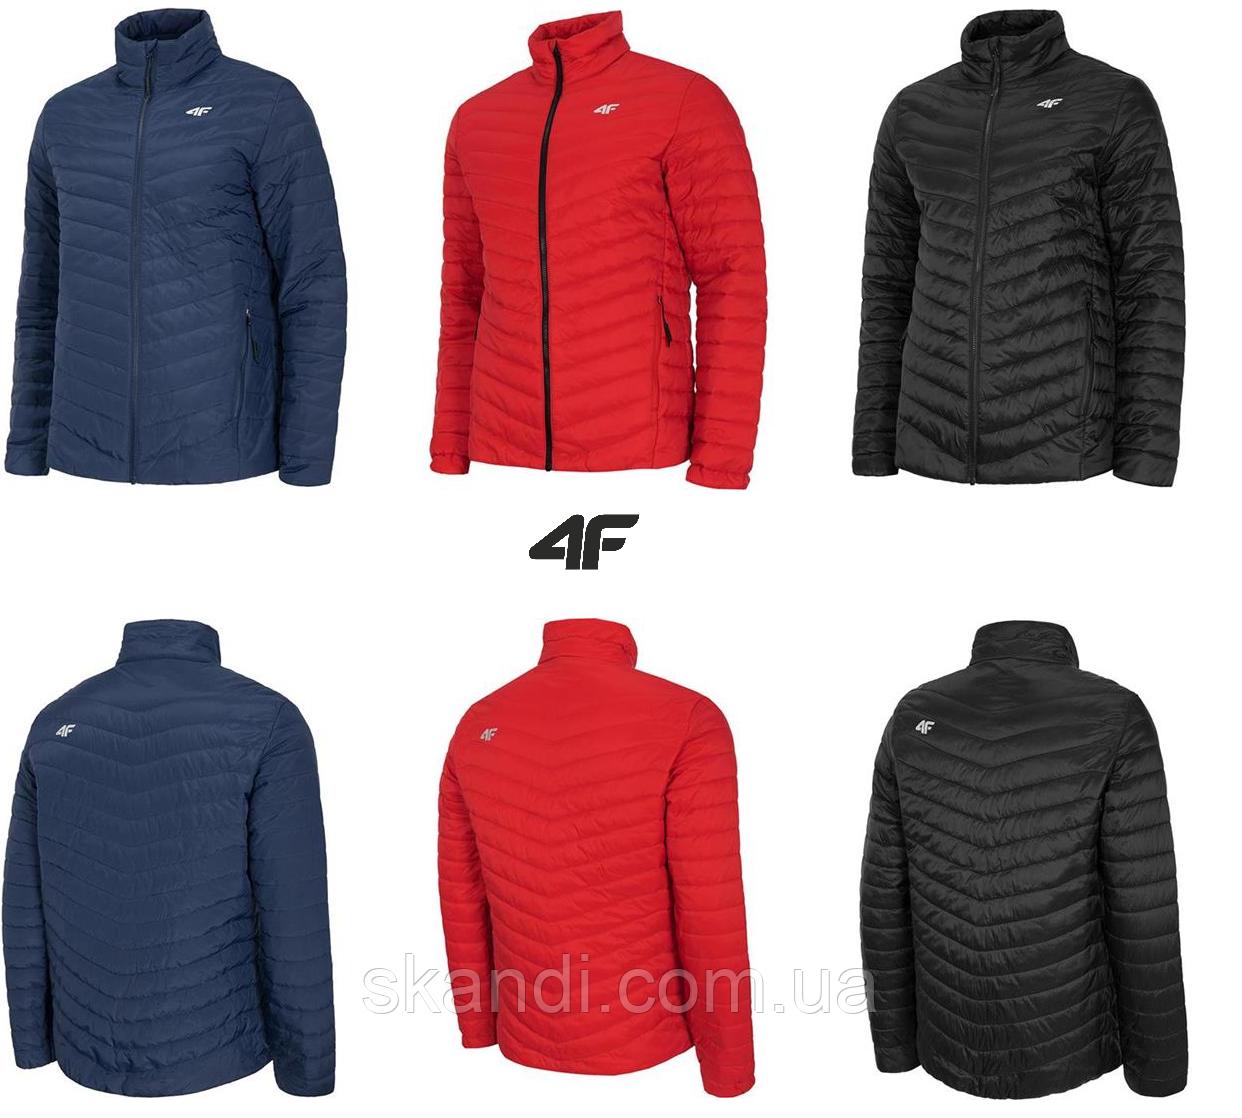 Крутейшая мужская куртка 4F(Оригинал) S\M\L\XL\2XL\3XL